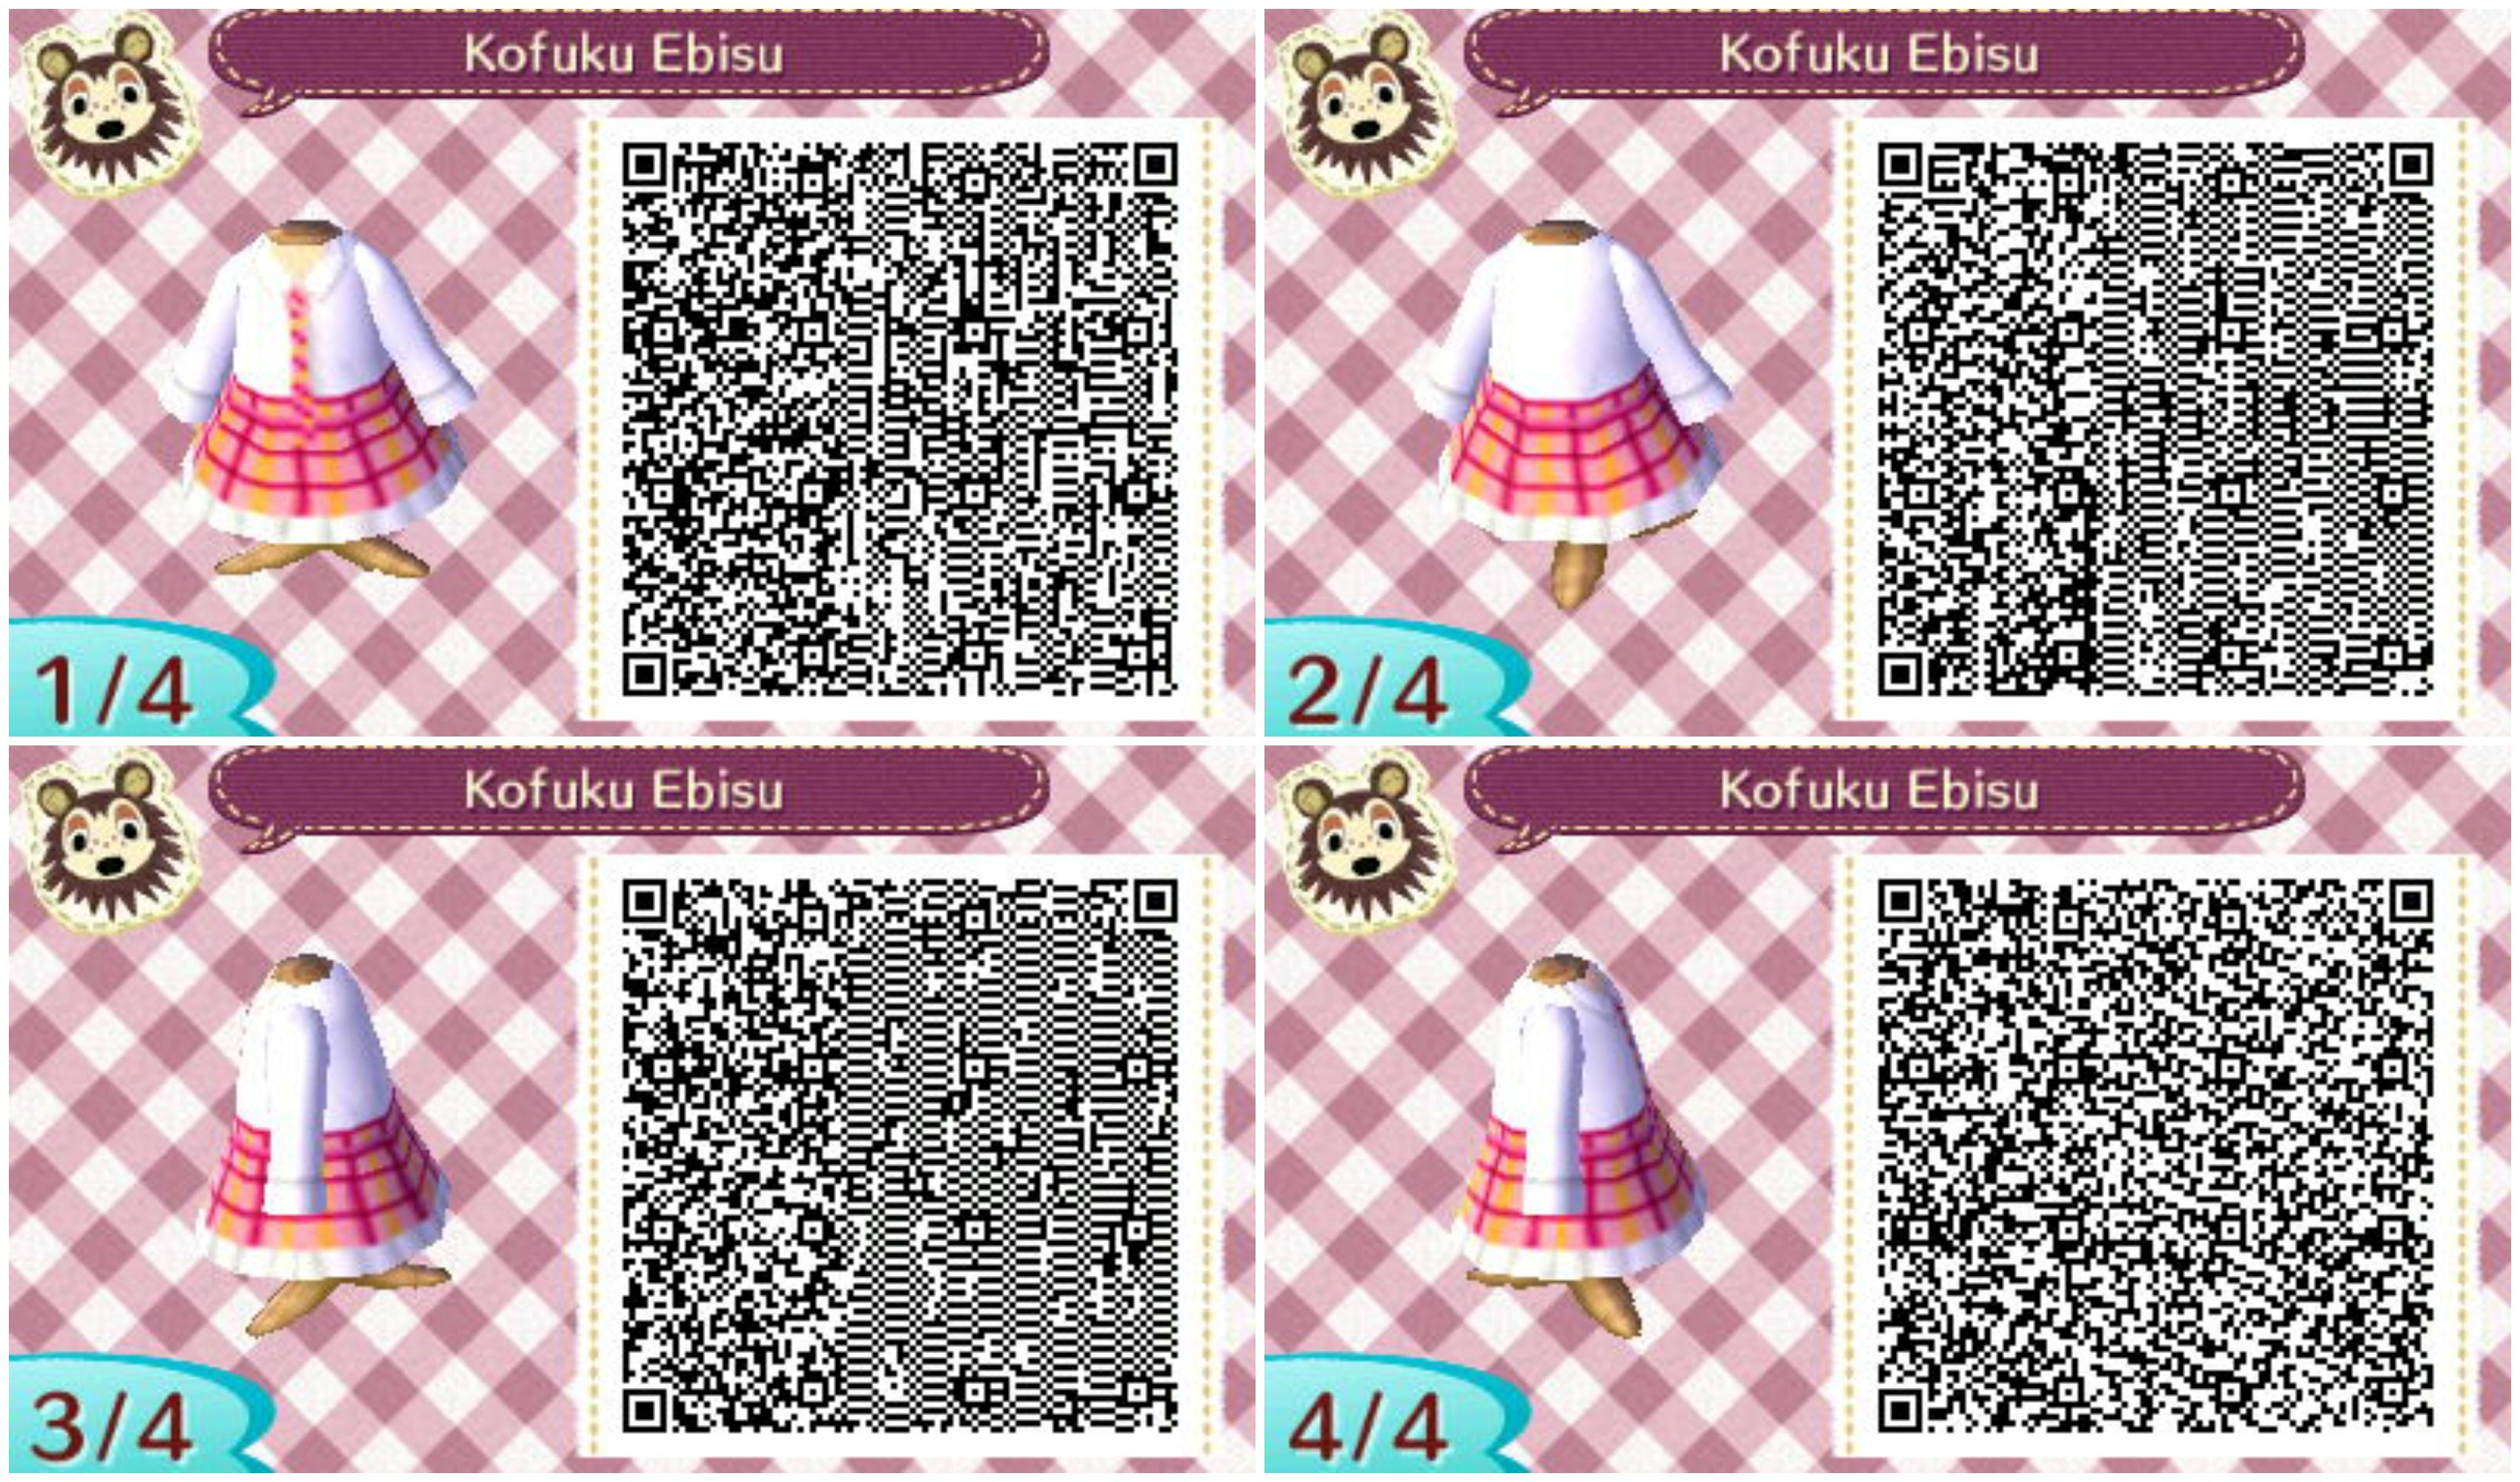 Kofuku Ebisu Outfit Noragami Anime Qr Code Animal Crossing New